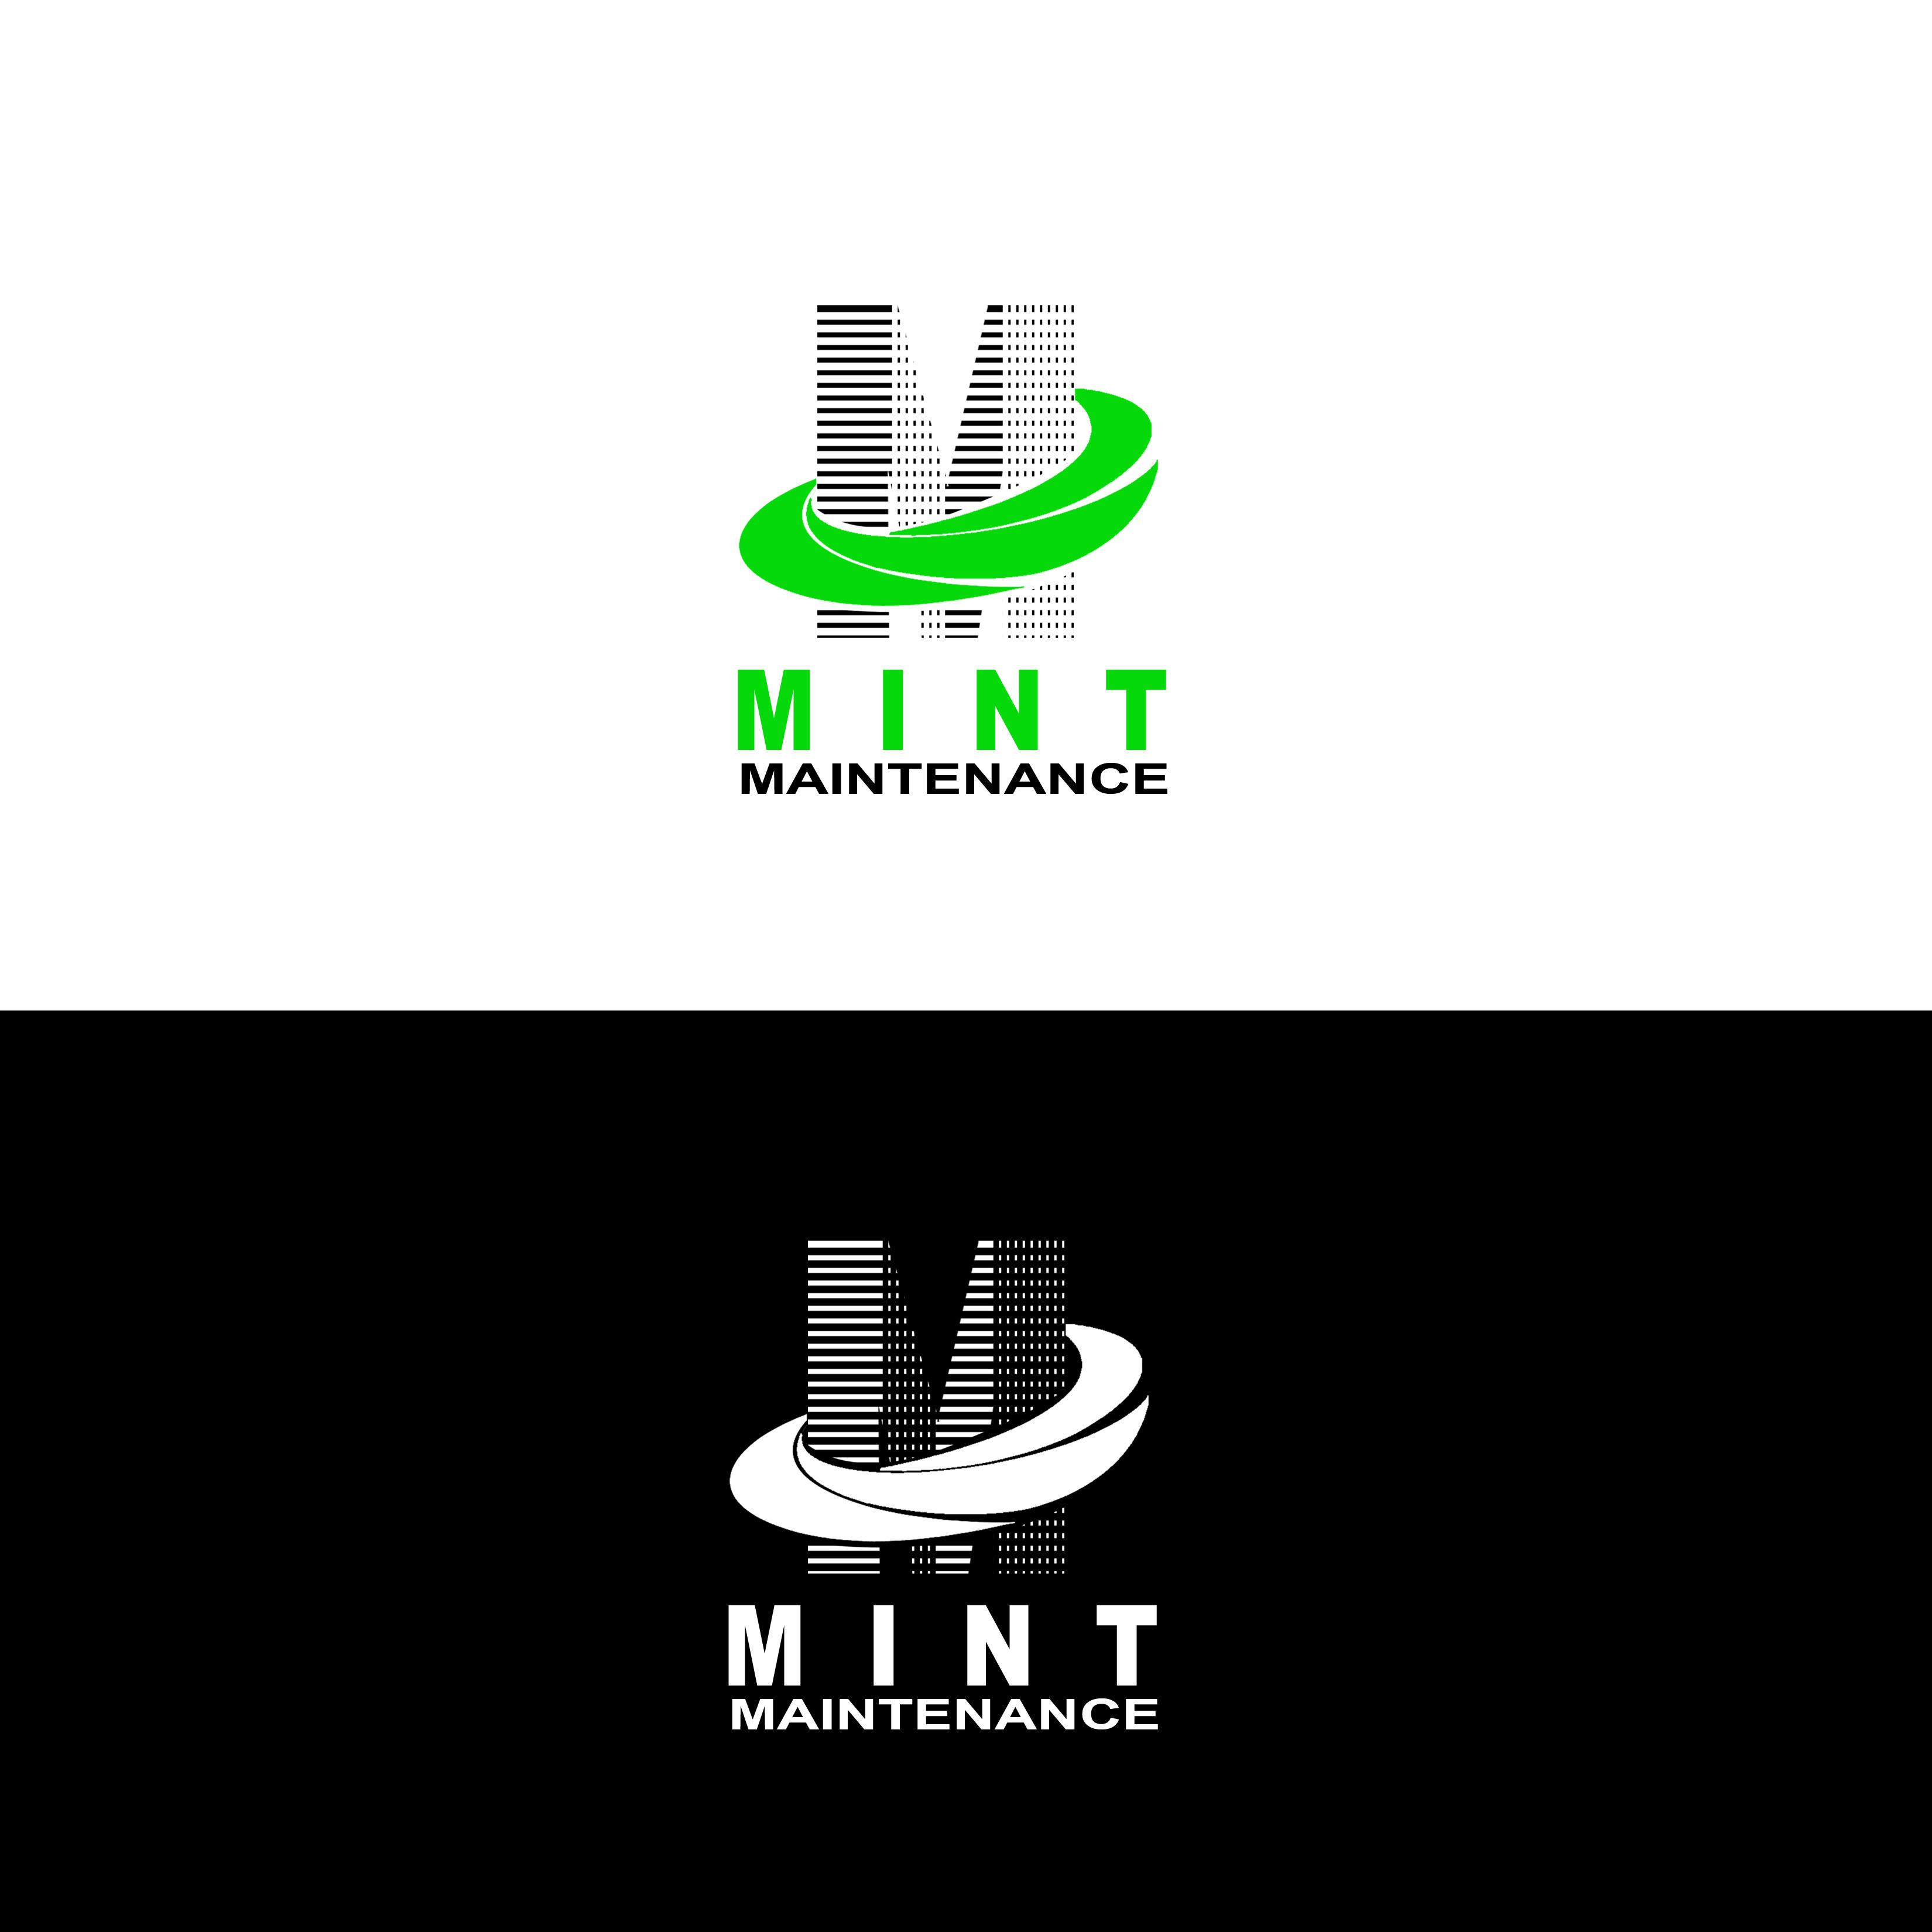 Logo Design by Allan Esclamado - Entry No. 211 in the Logo Design Contest Creative Logo Design for Mint Maintenance.